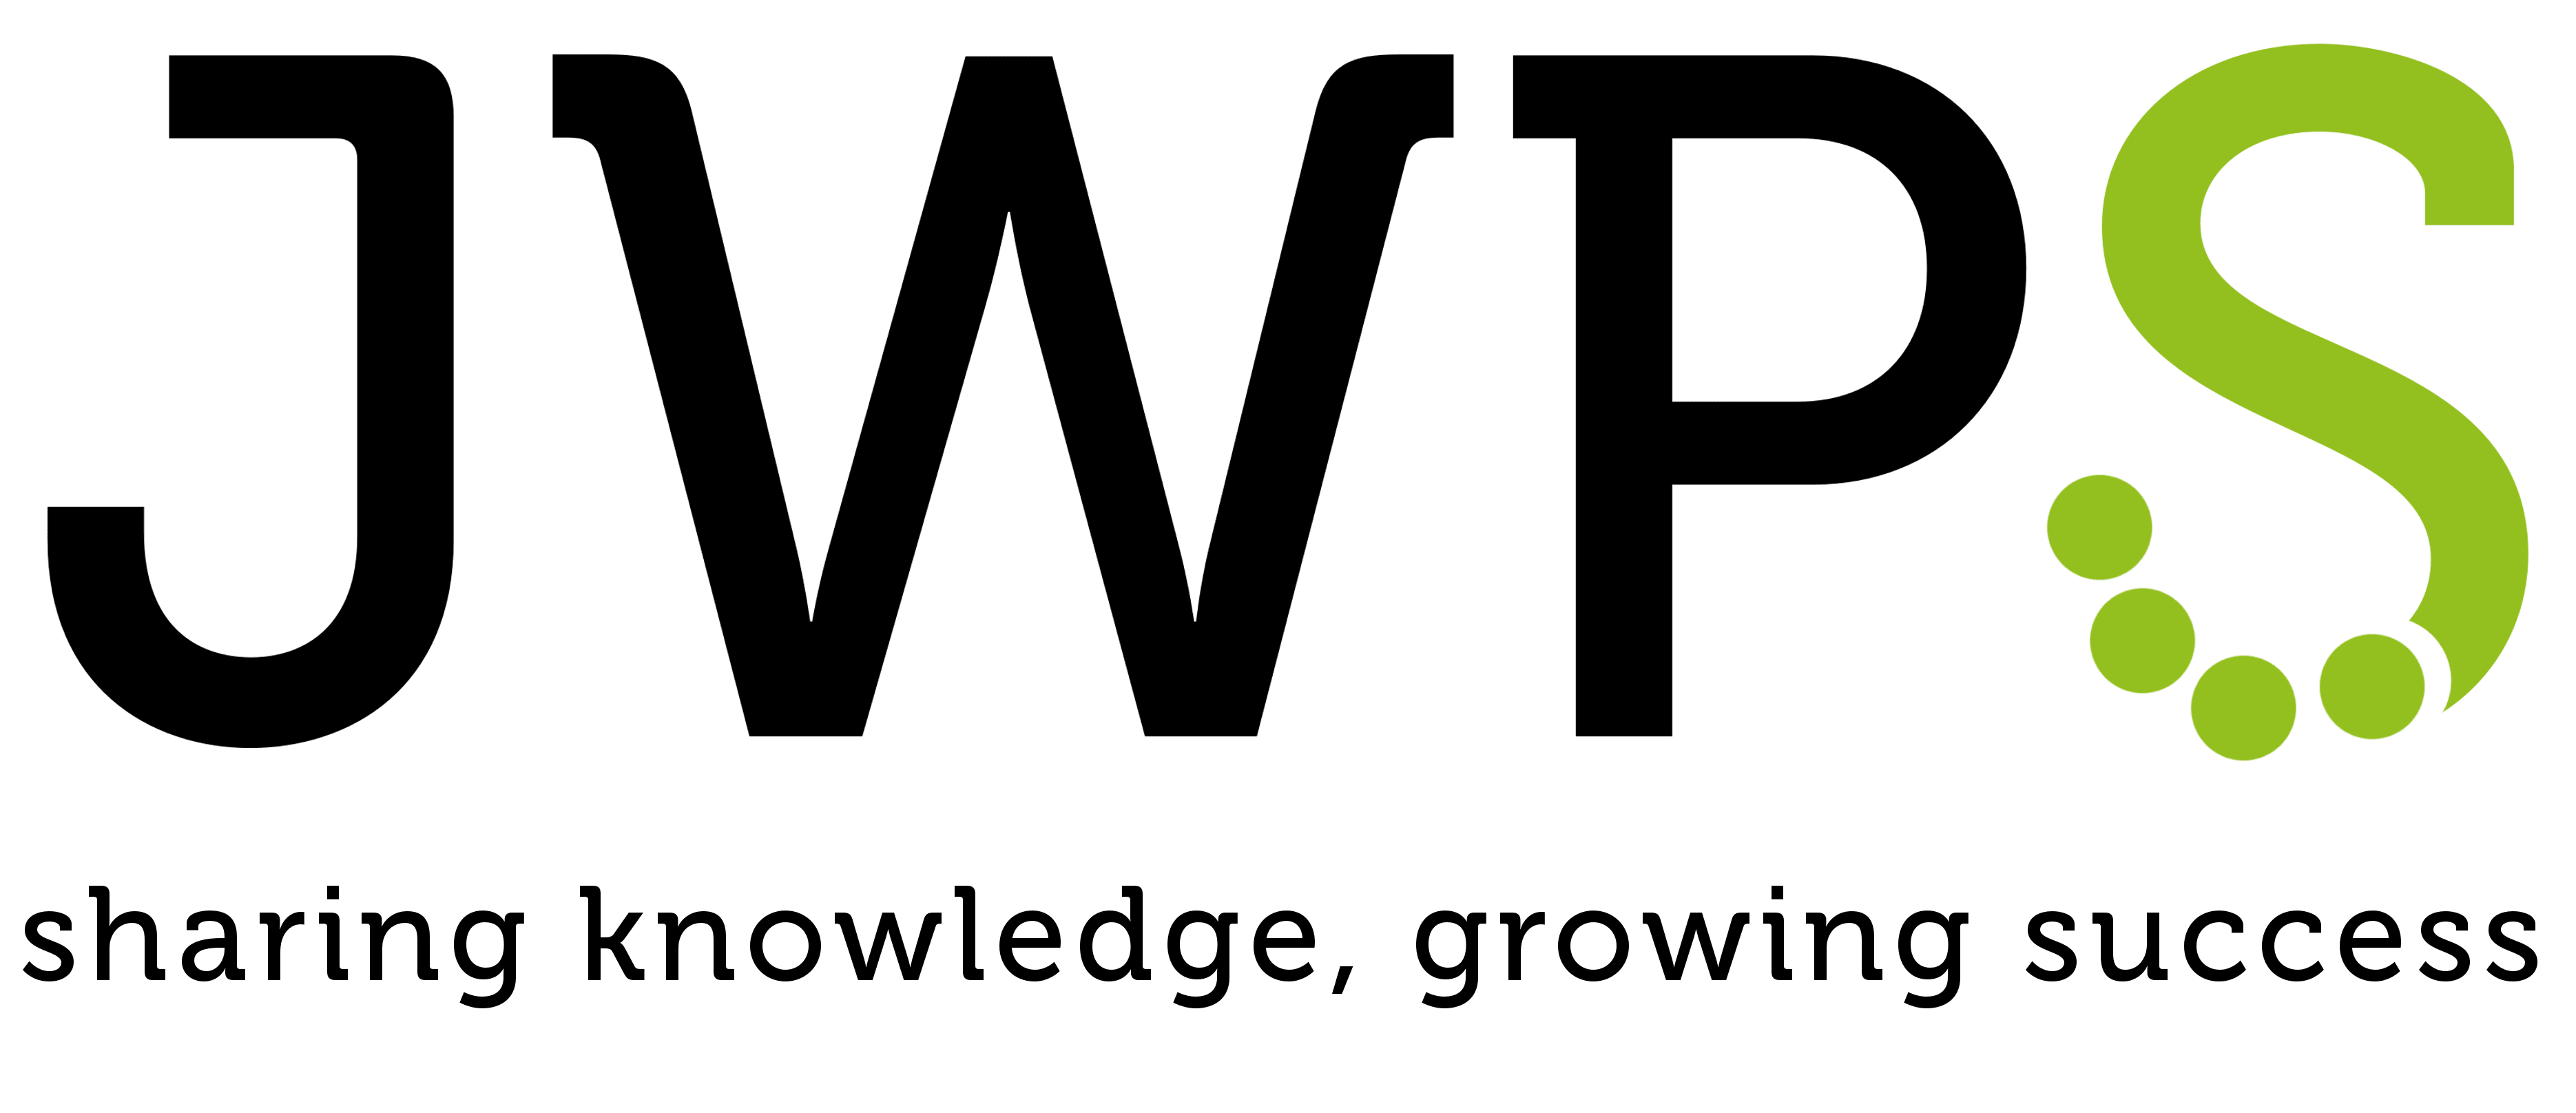 JWP Success